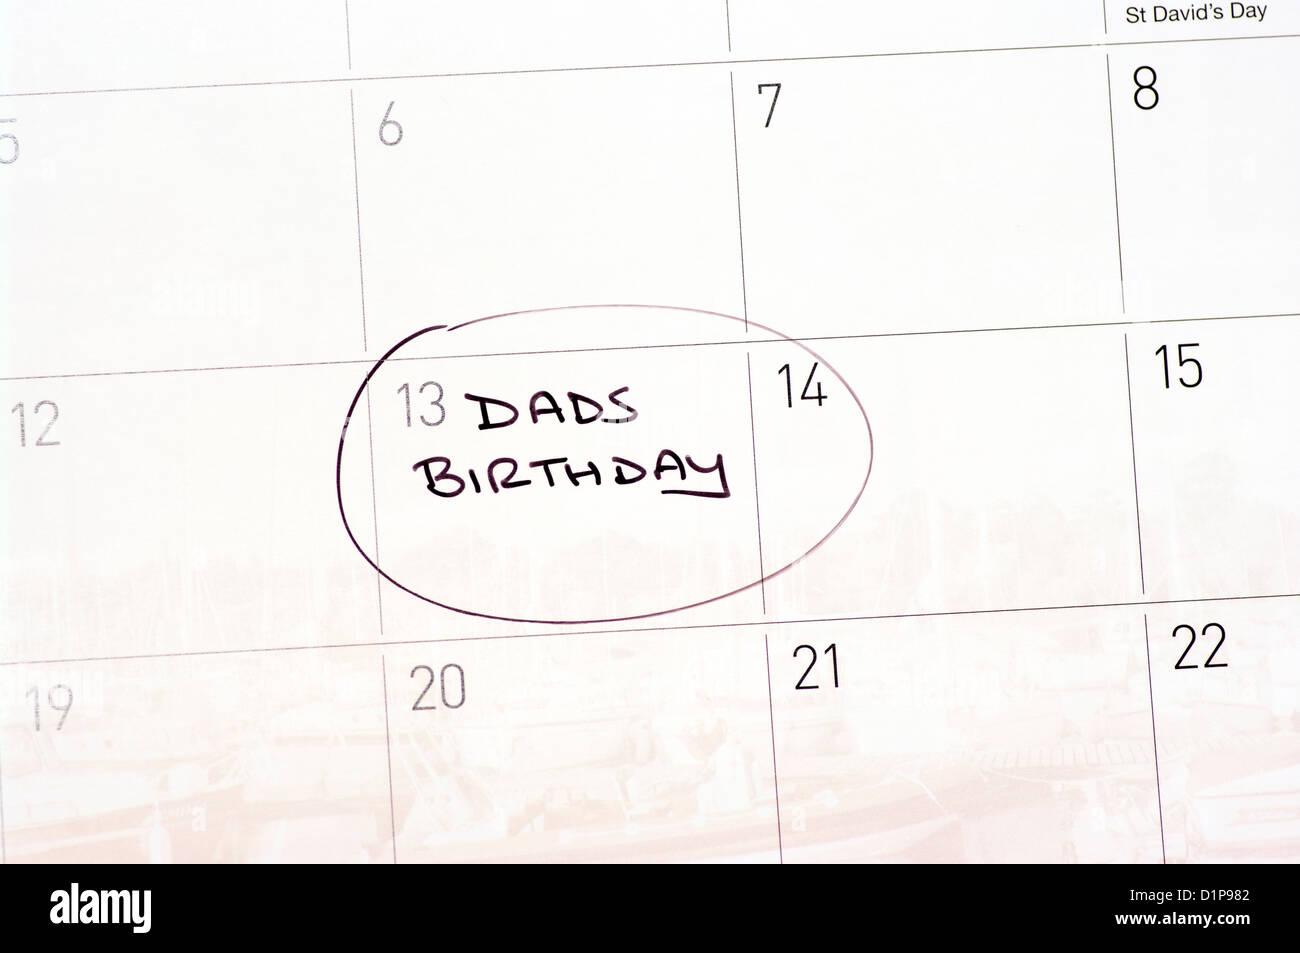 Dads Birthday Reminder Circled On A Calendar - Stock Image